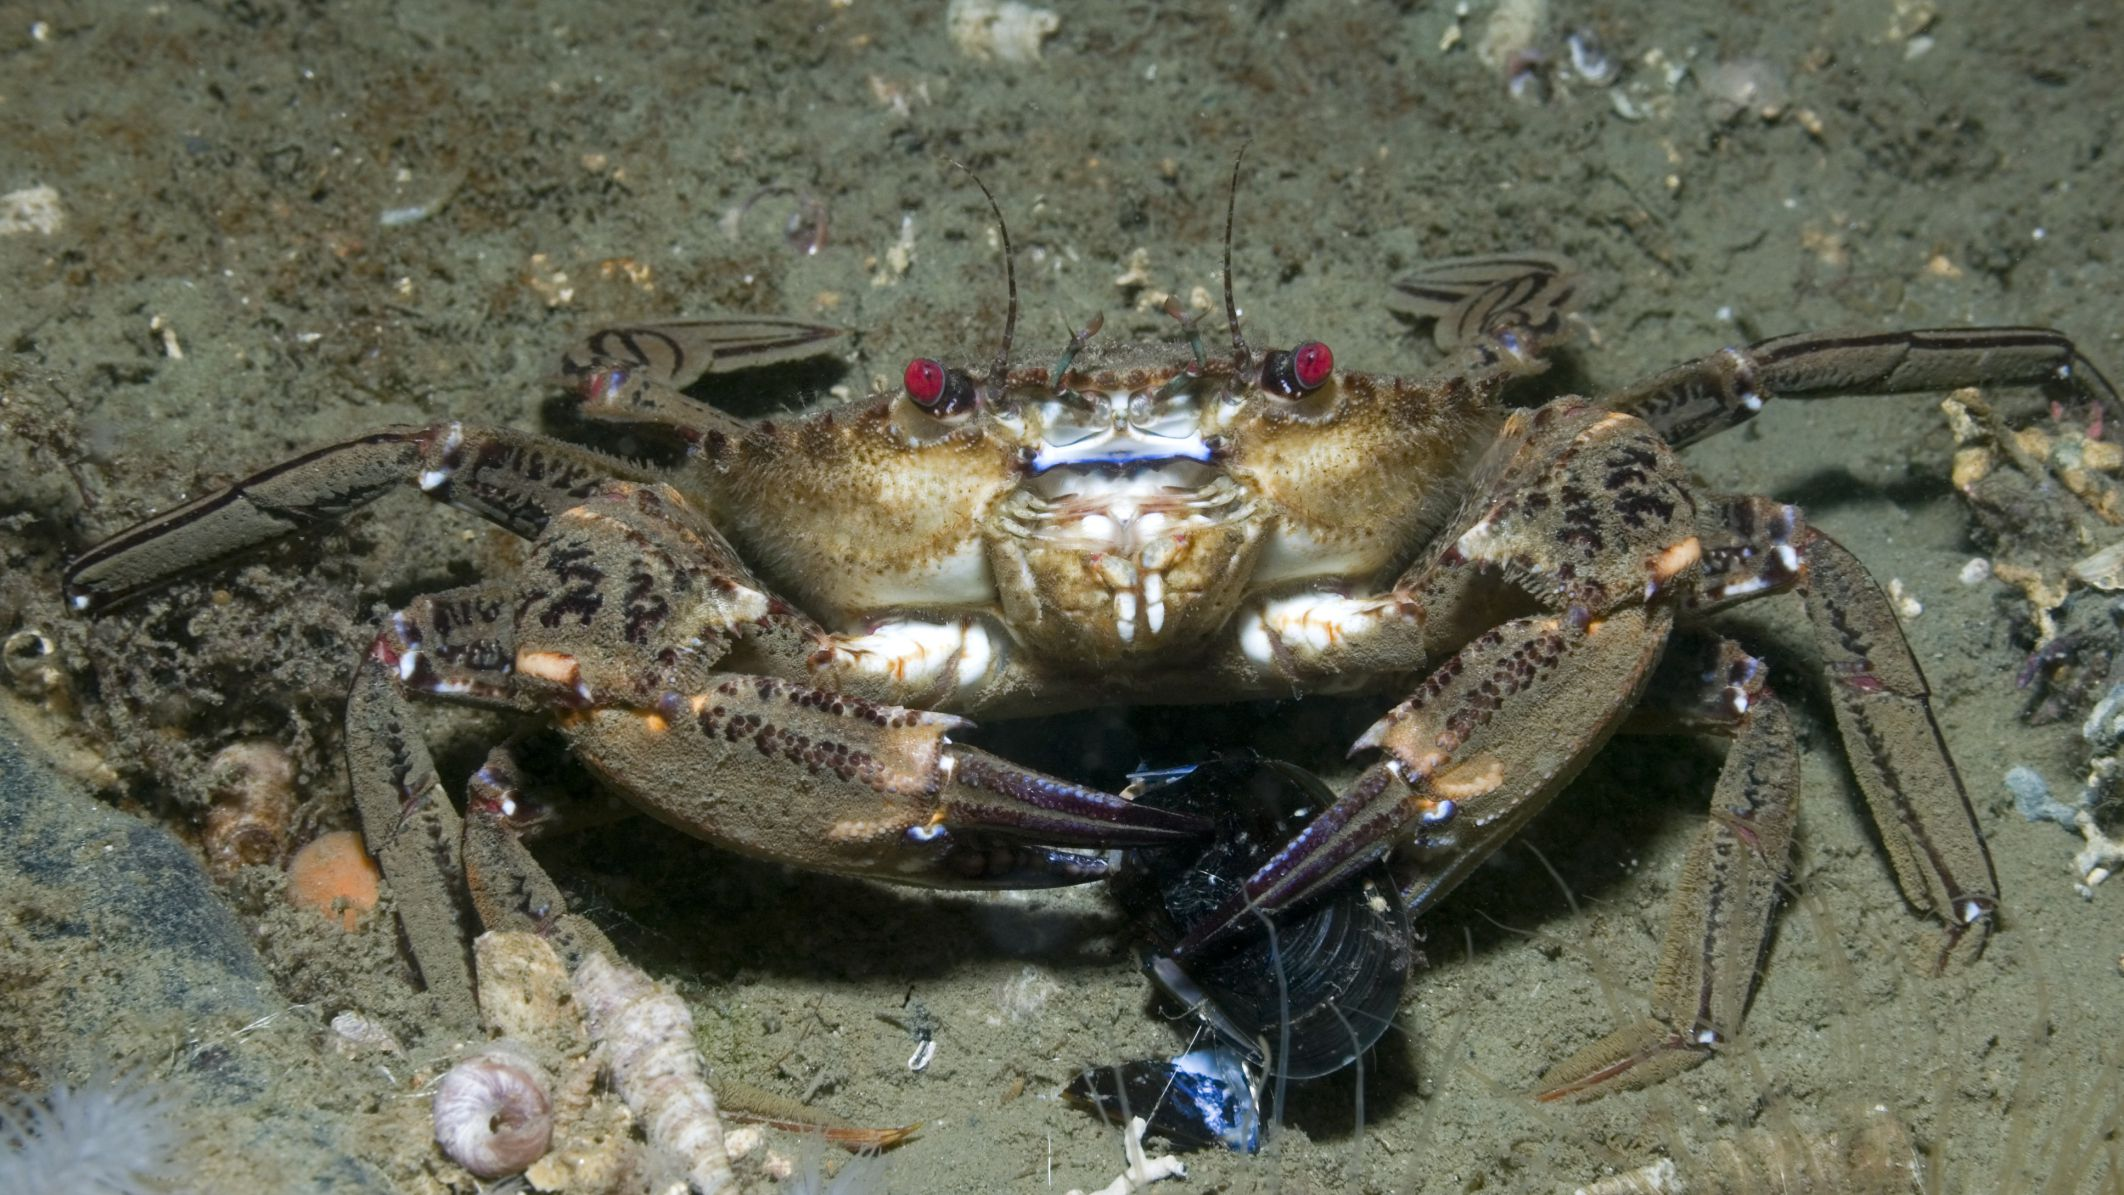 velvet-crab-eating-paulkay-getty-56a5f7a63df78cf7728abf16.jpg